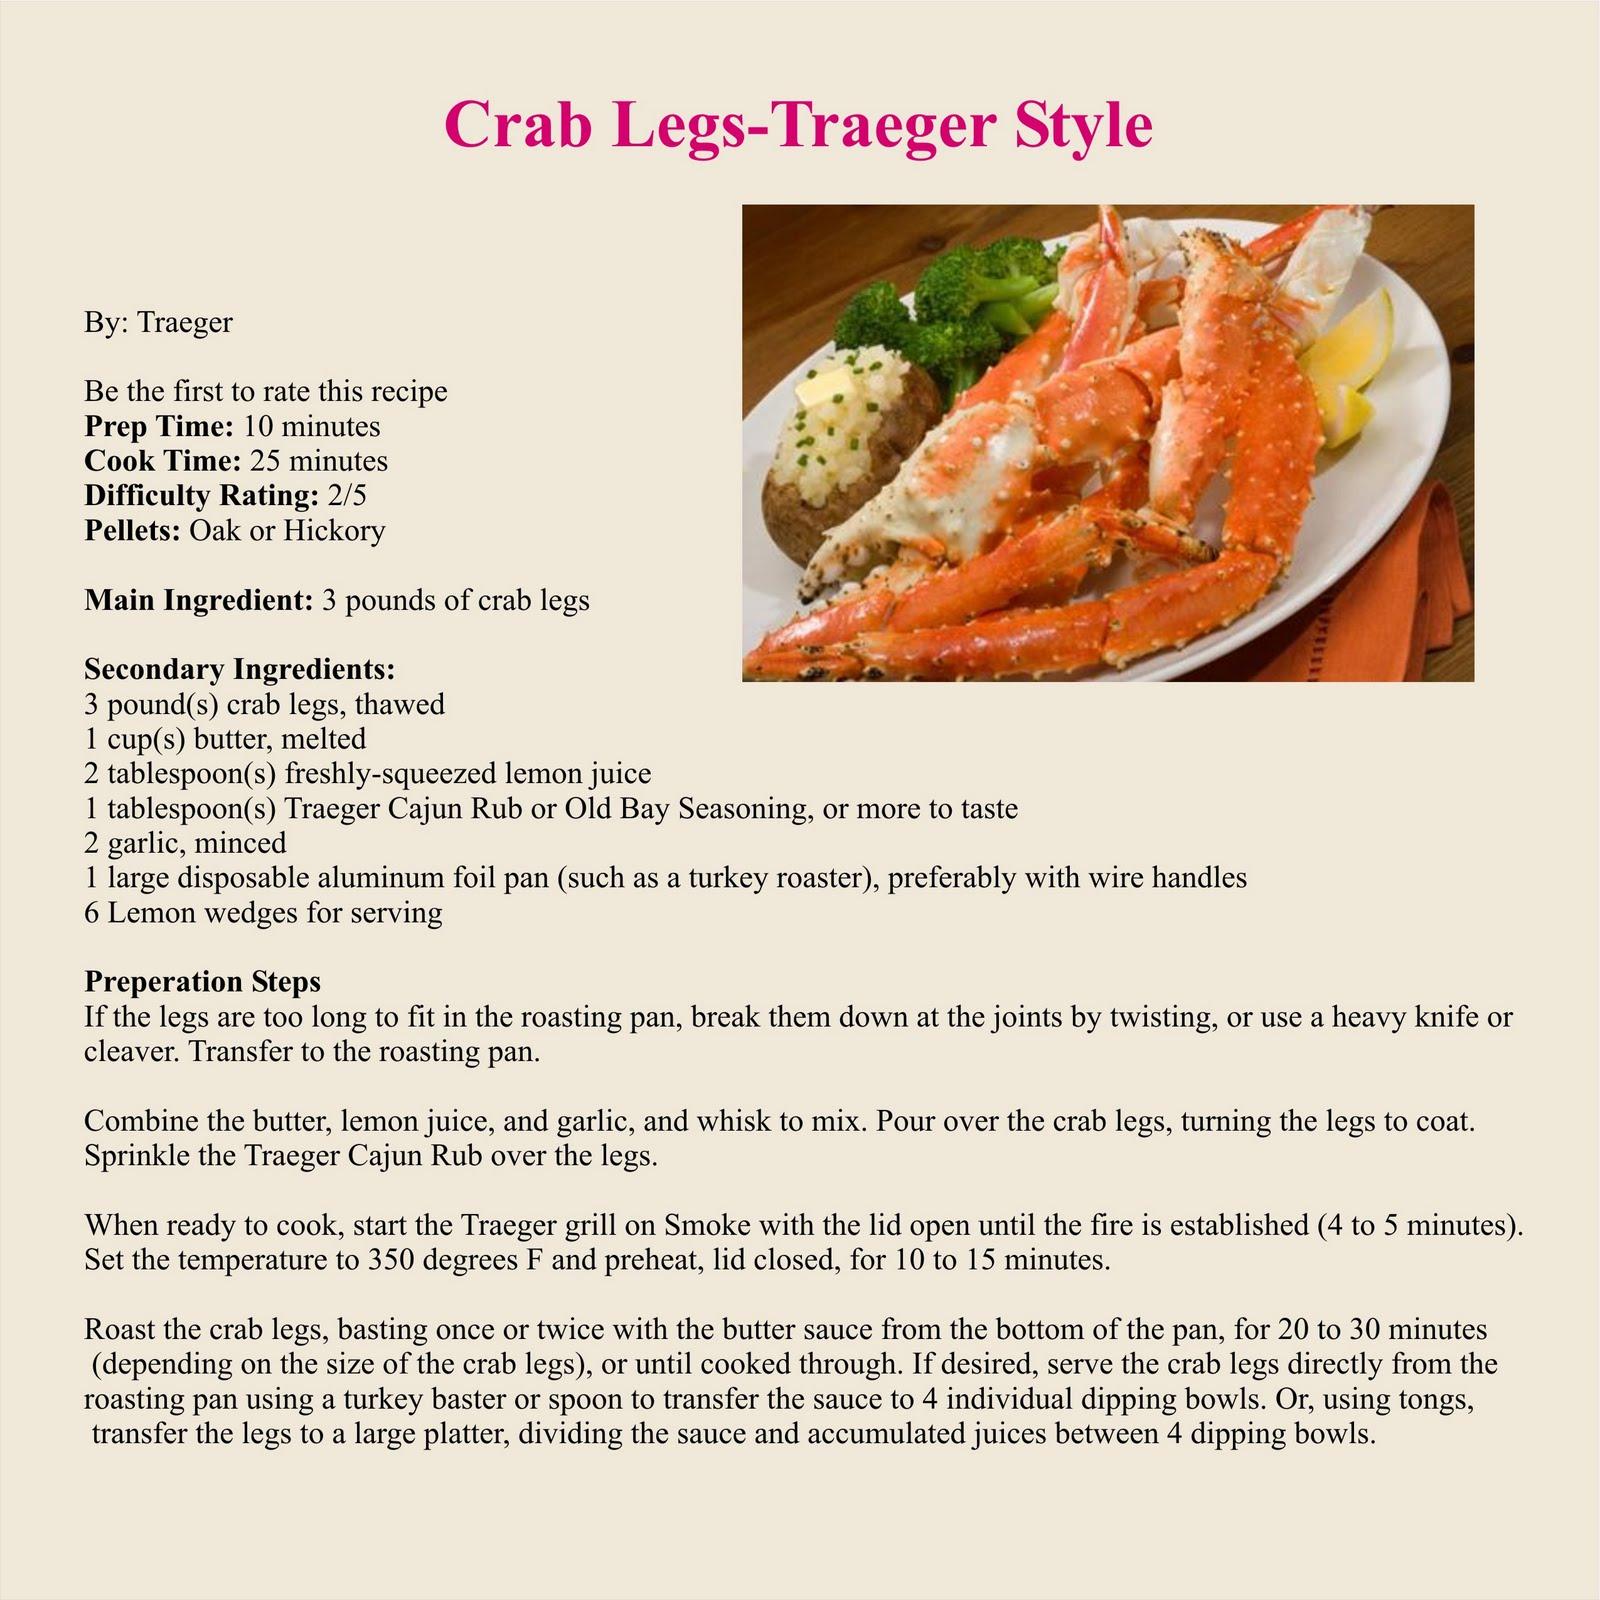 Traeger Grills: Crab Legs Traeger Style